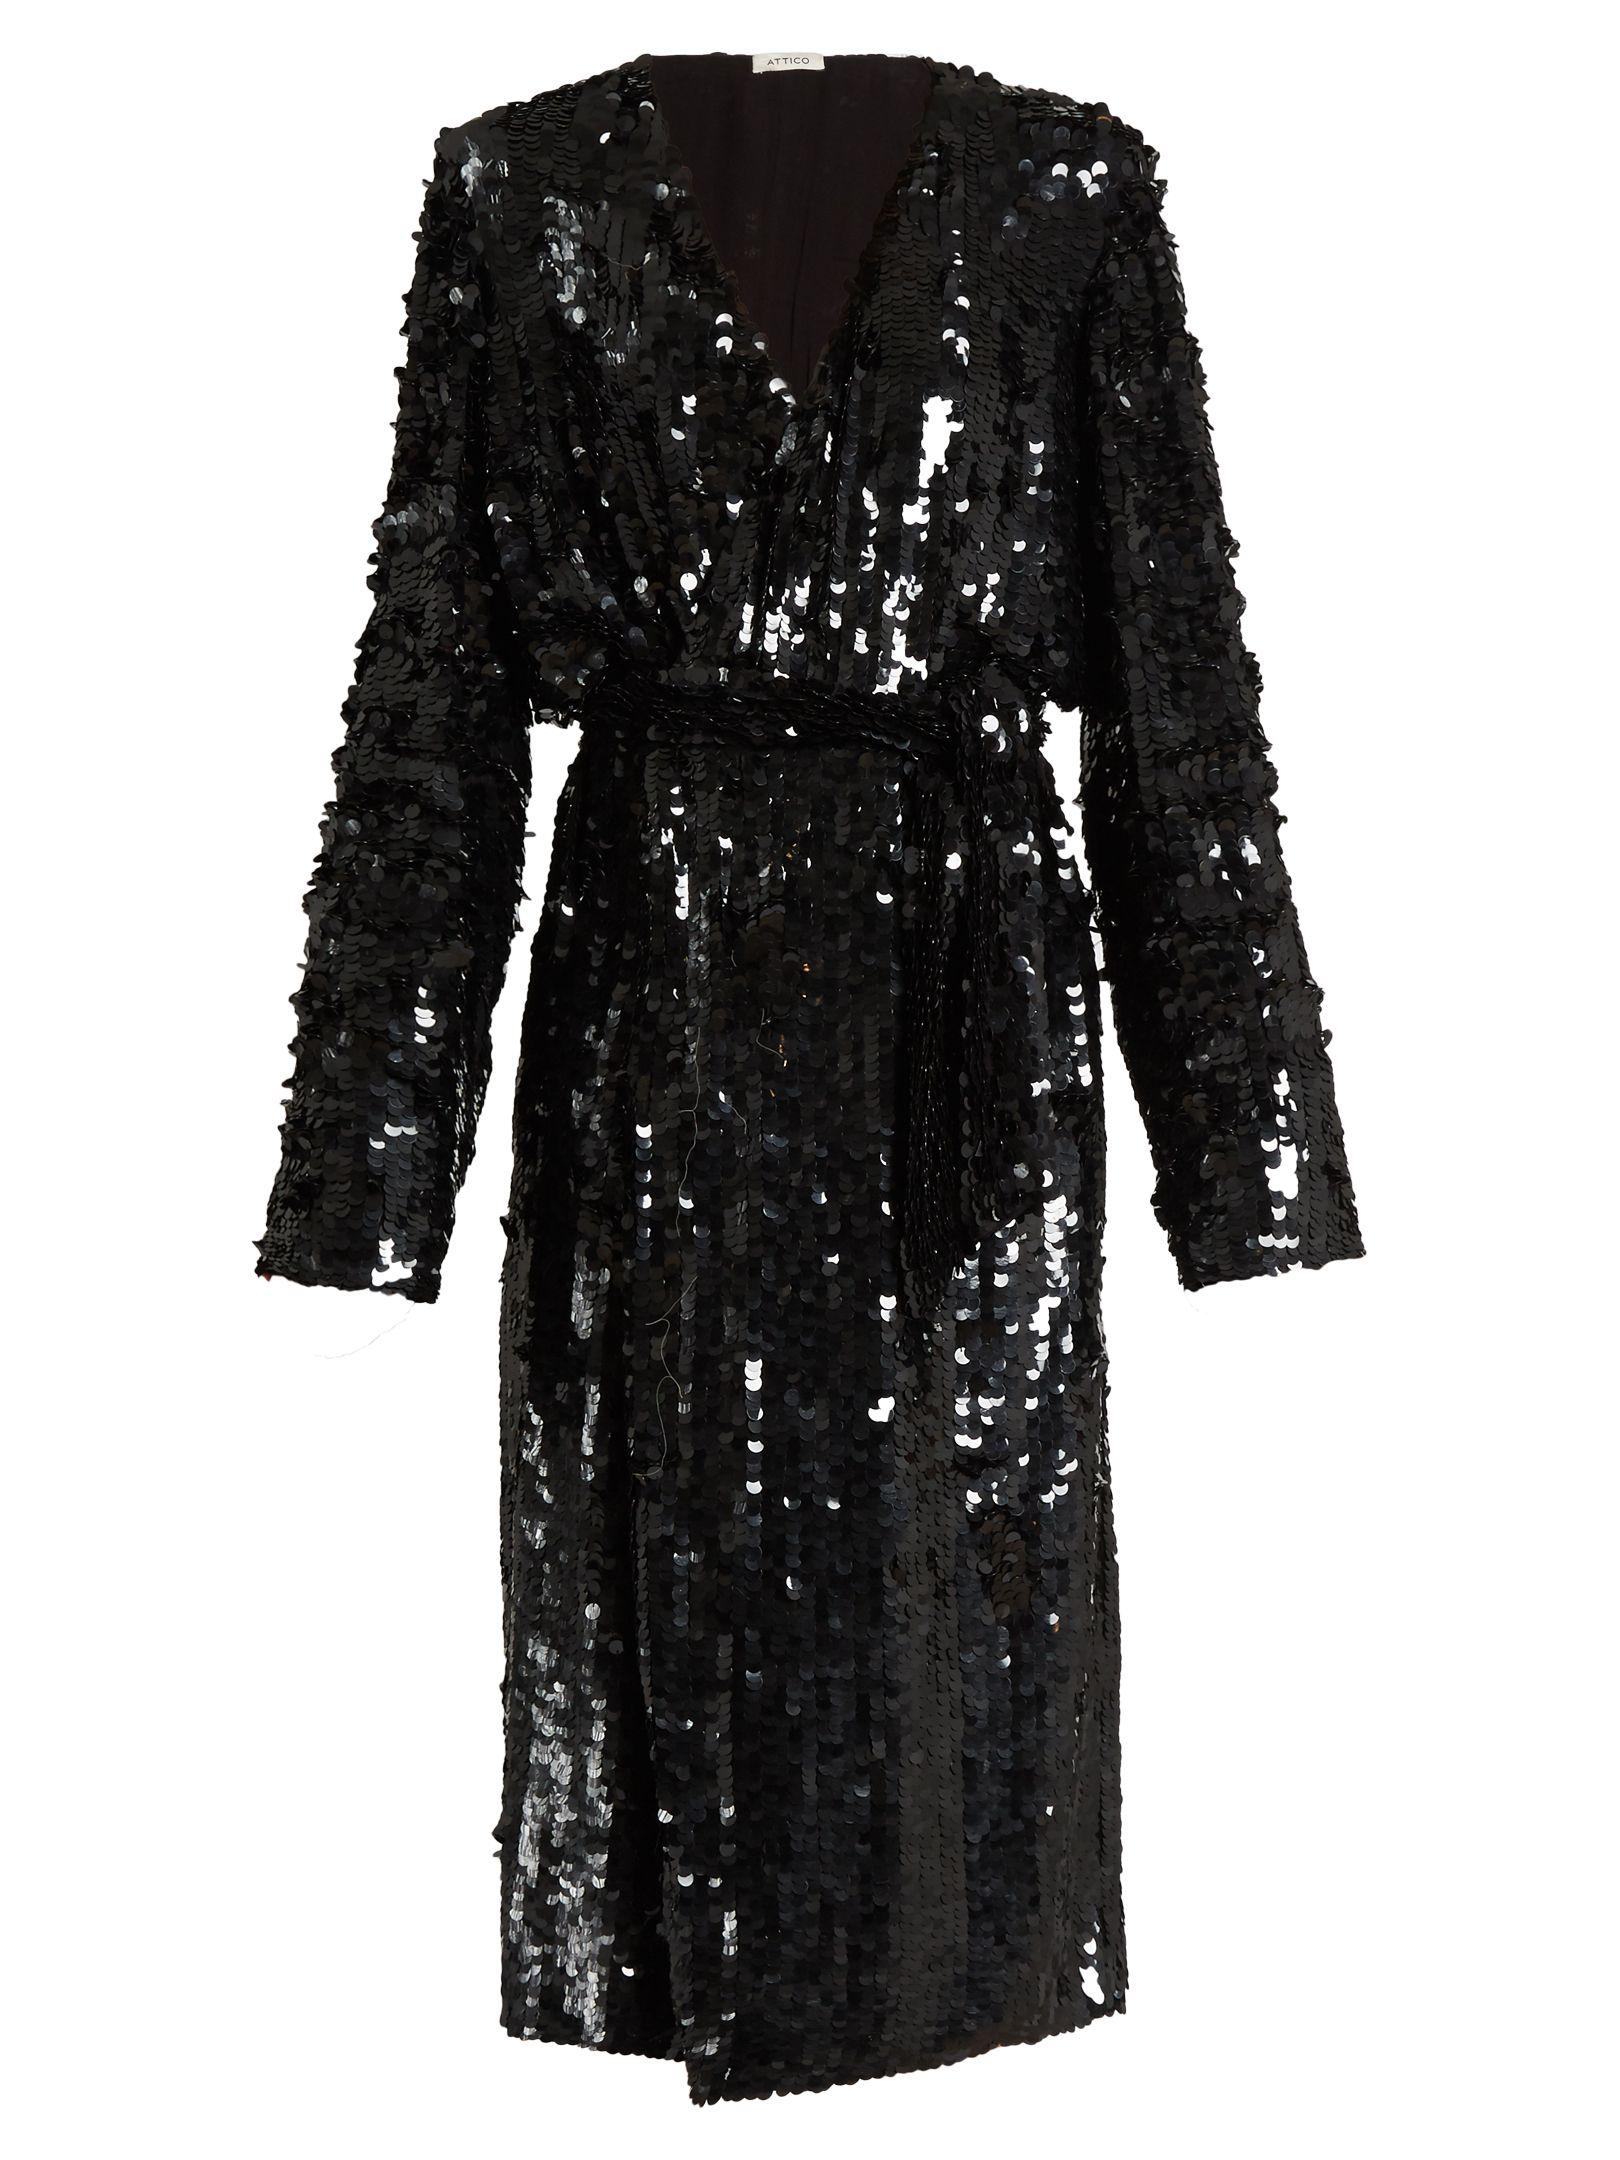 5c1df269eace4 ATTICO Dara sequin-embellished wrap dress | Dress | Dresses, Sequin ...